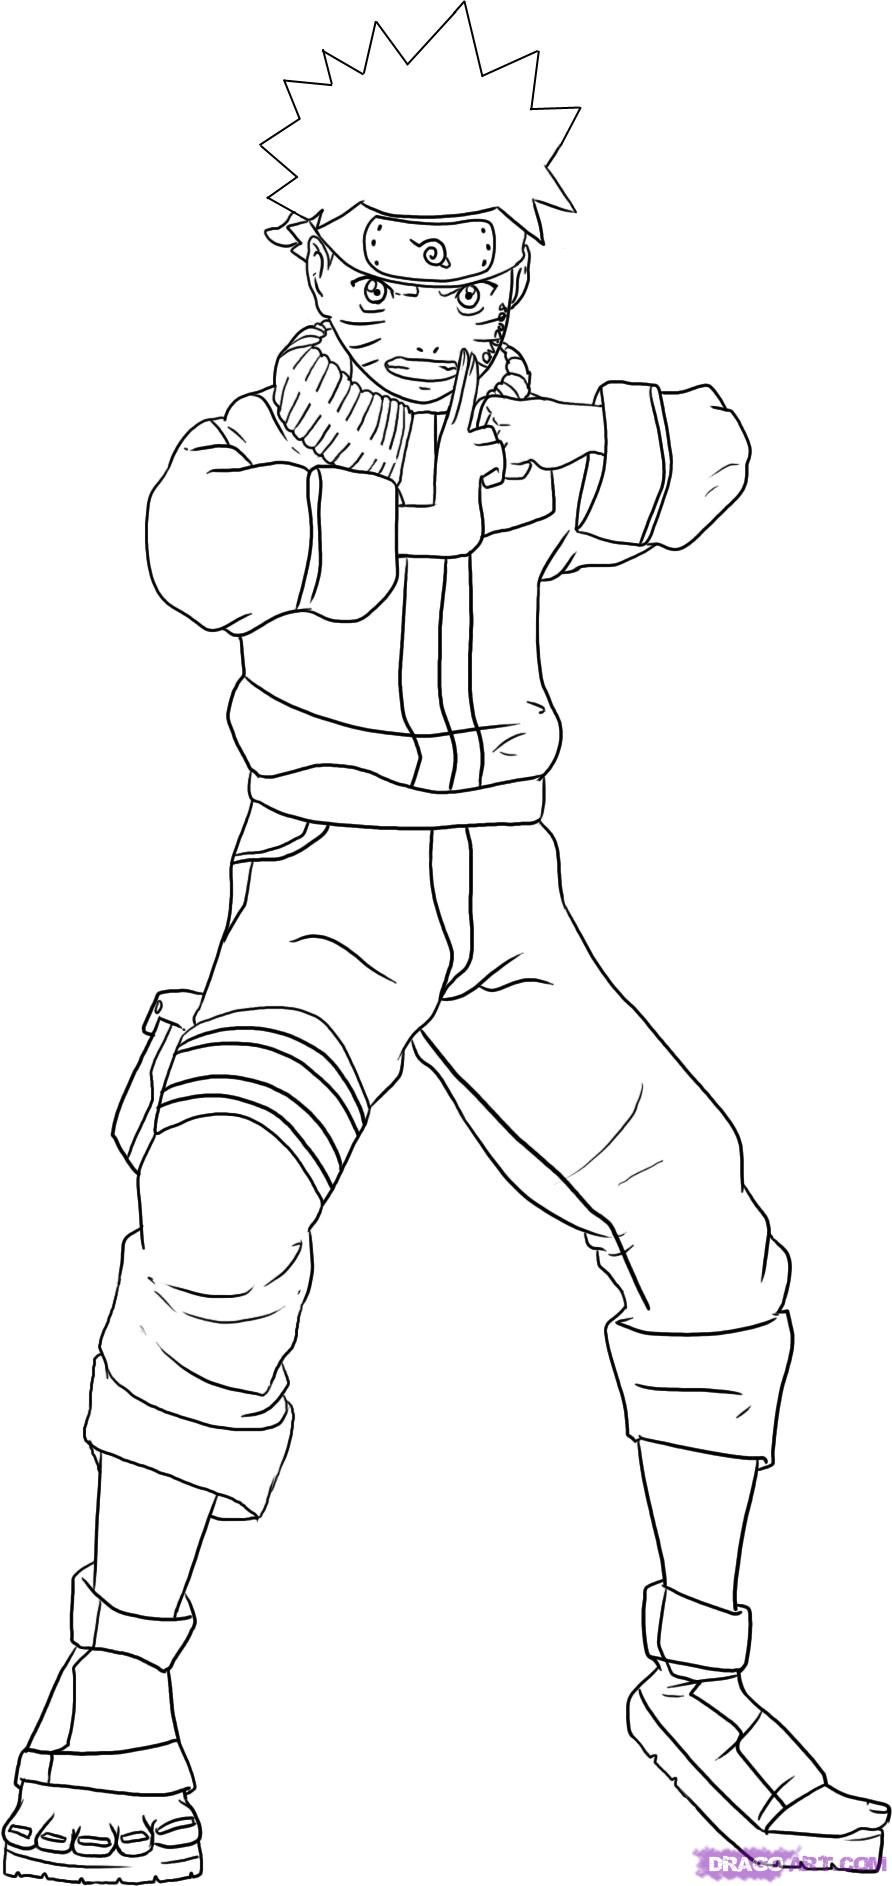 how to draw kakashi hatake from naruto step 6